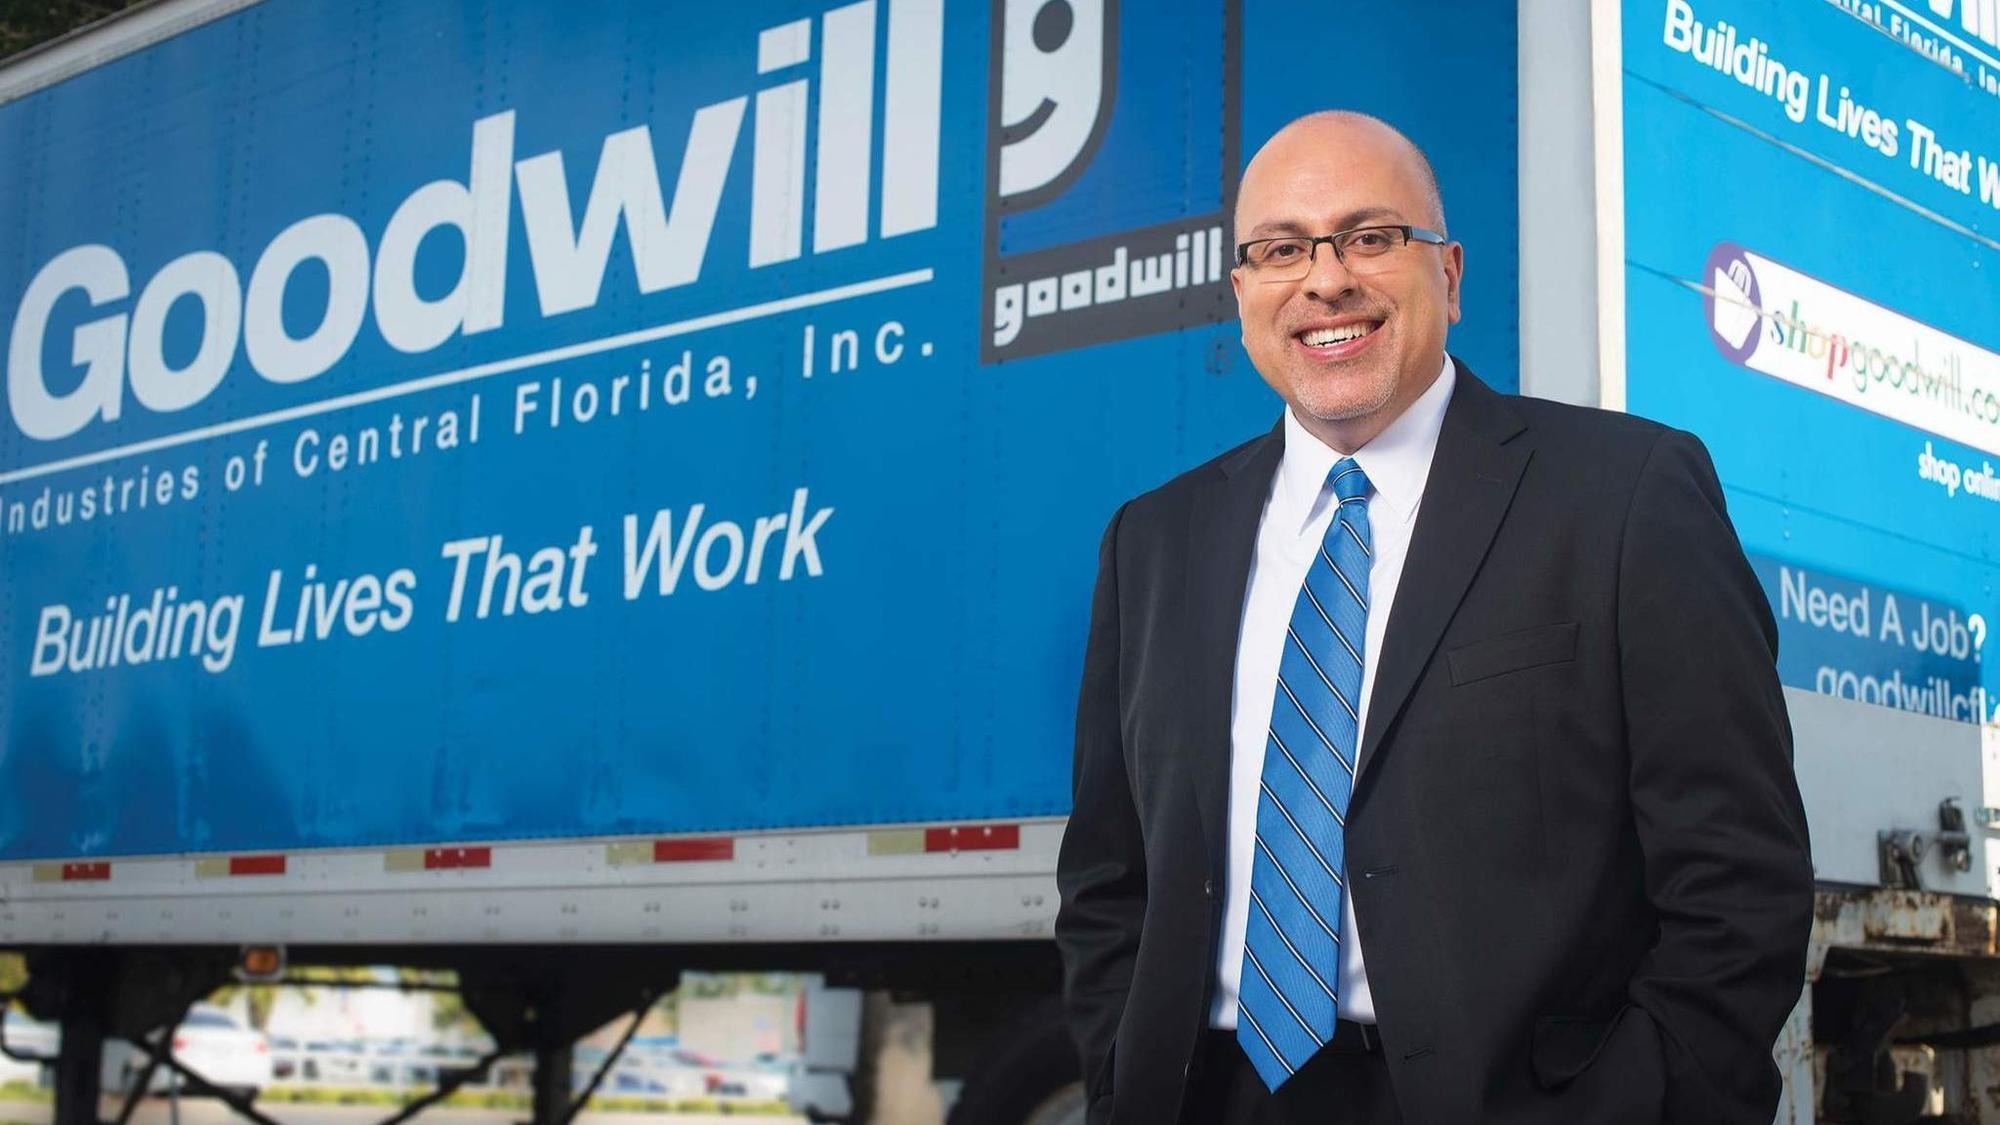 549a956ff9 Goodwill hires former retail executive Nima Hodaei as its new CEO - Orlando  Sentinel